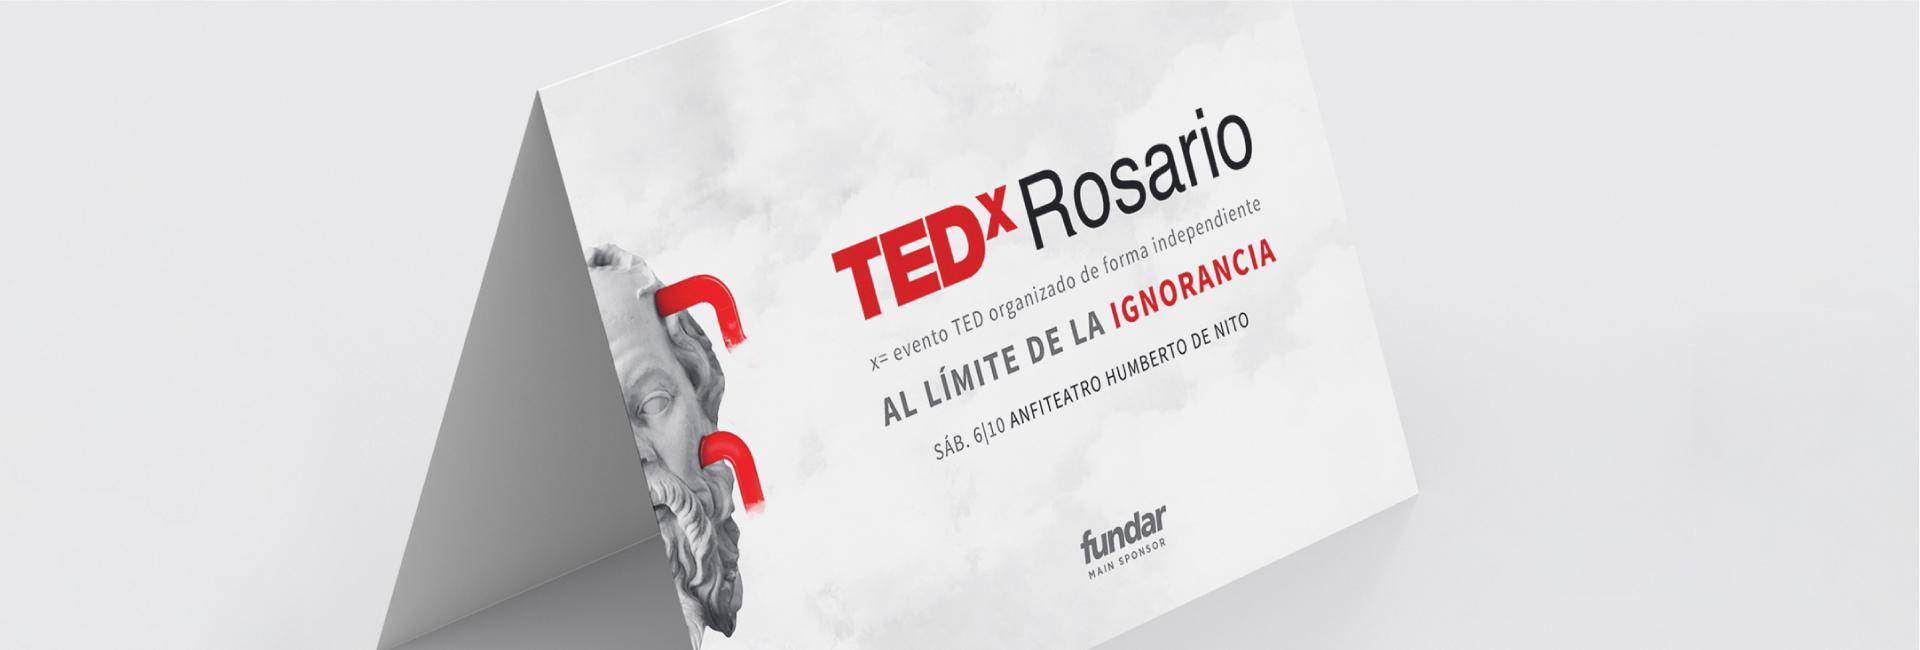 TEDx Rosario 2018